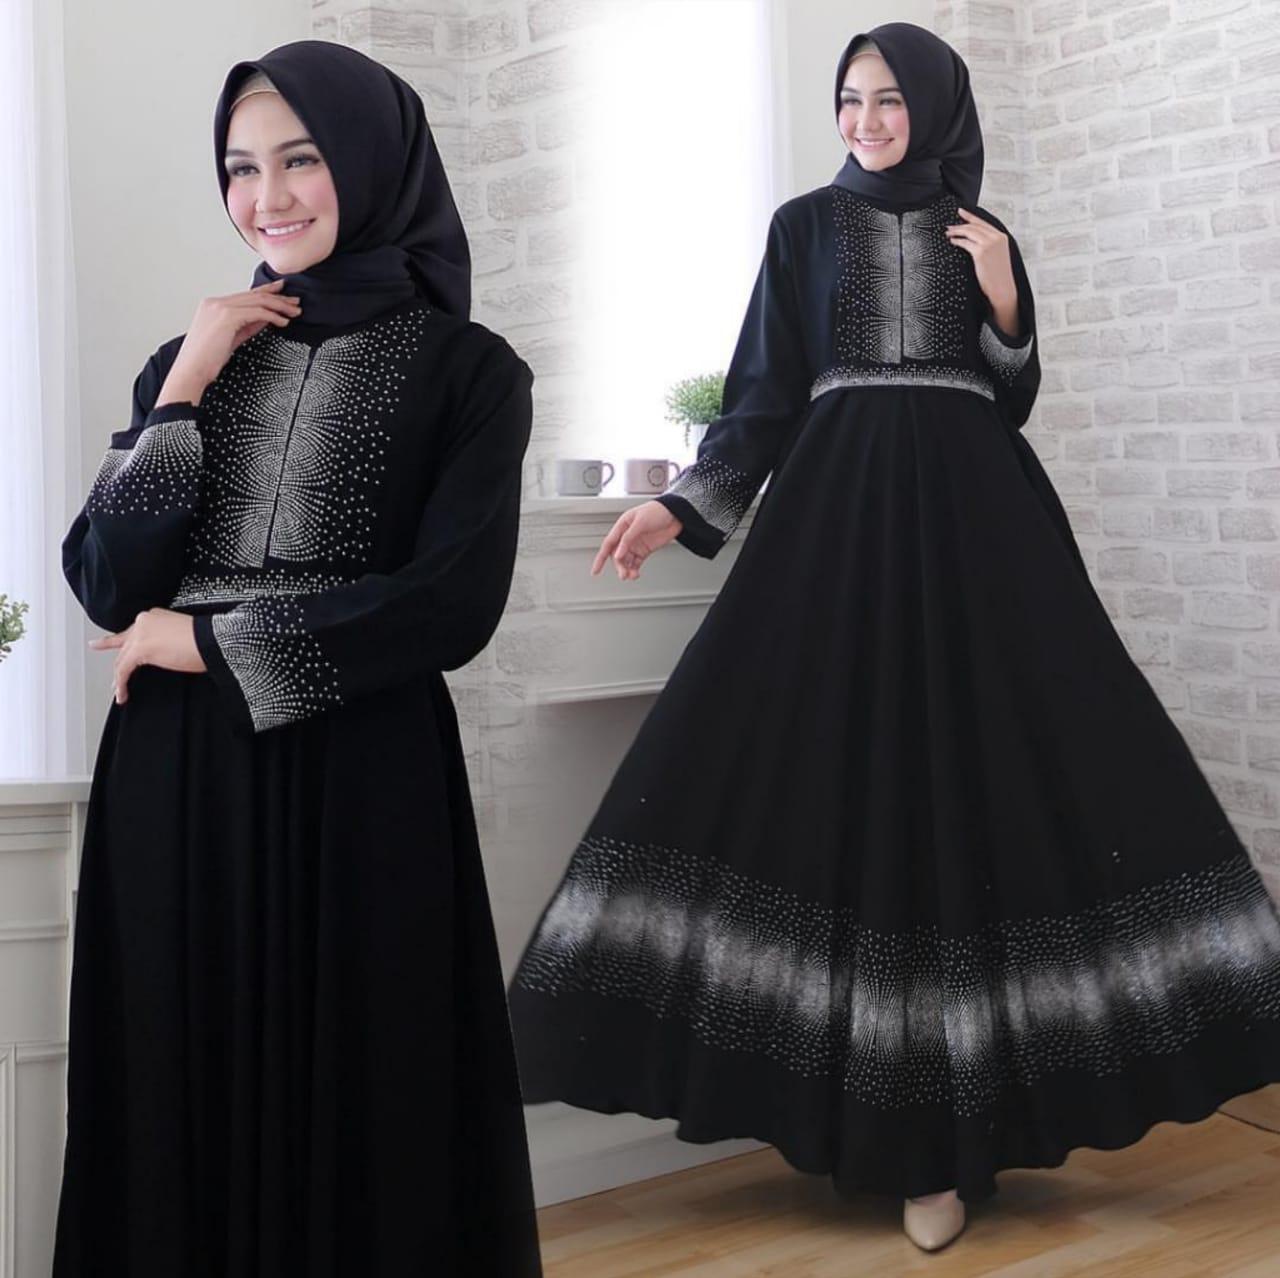 Gamis terbaru 11 terlaris gamis abaya arab hitam bordir Langsung- abaya  dubai muslim fashion terbaru/ gamis arab/ gamis muslim turkey_DD